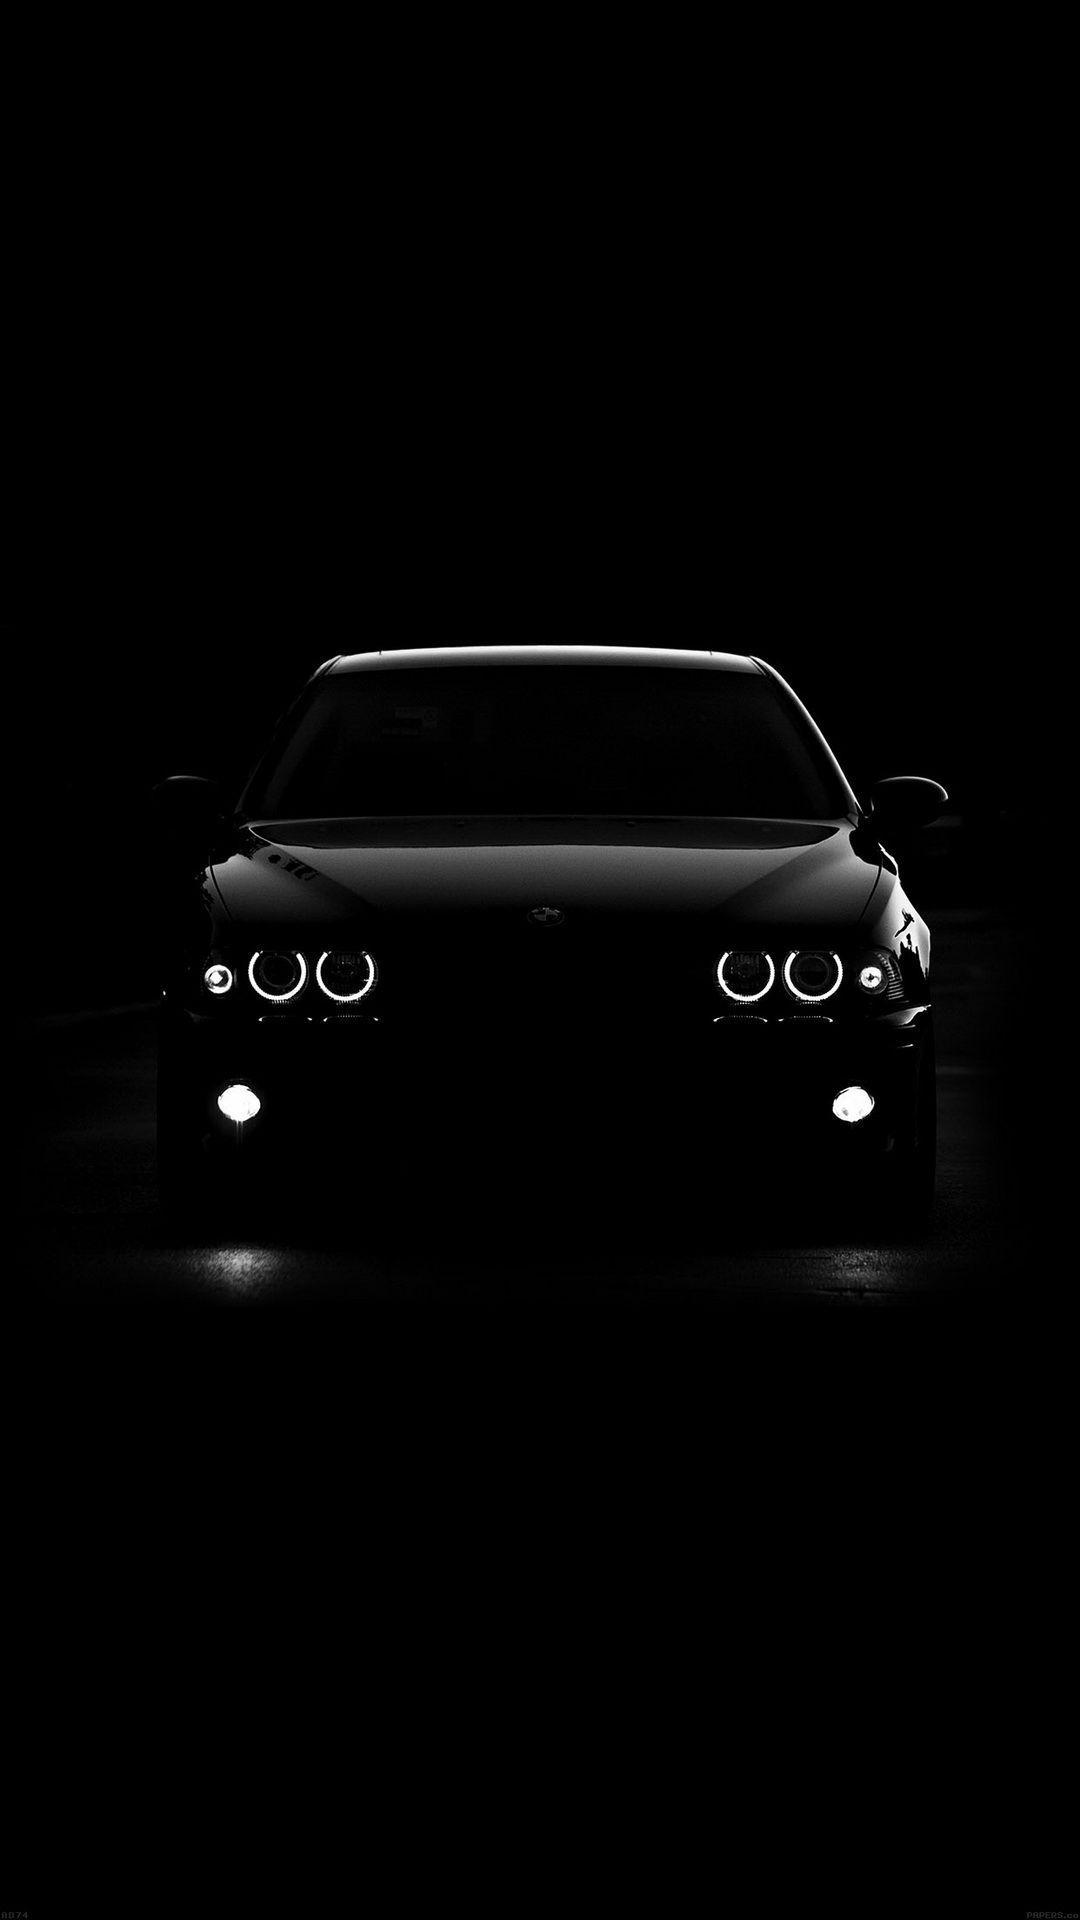 Black Car Hd Wallpapers Top Free Black Car Hd